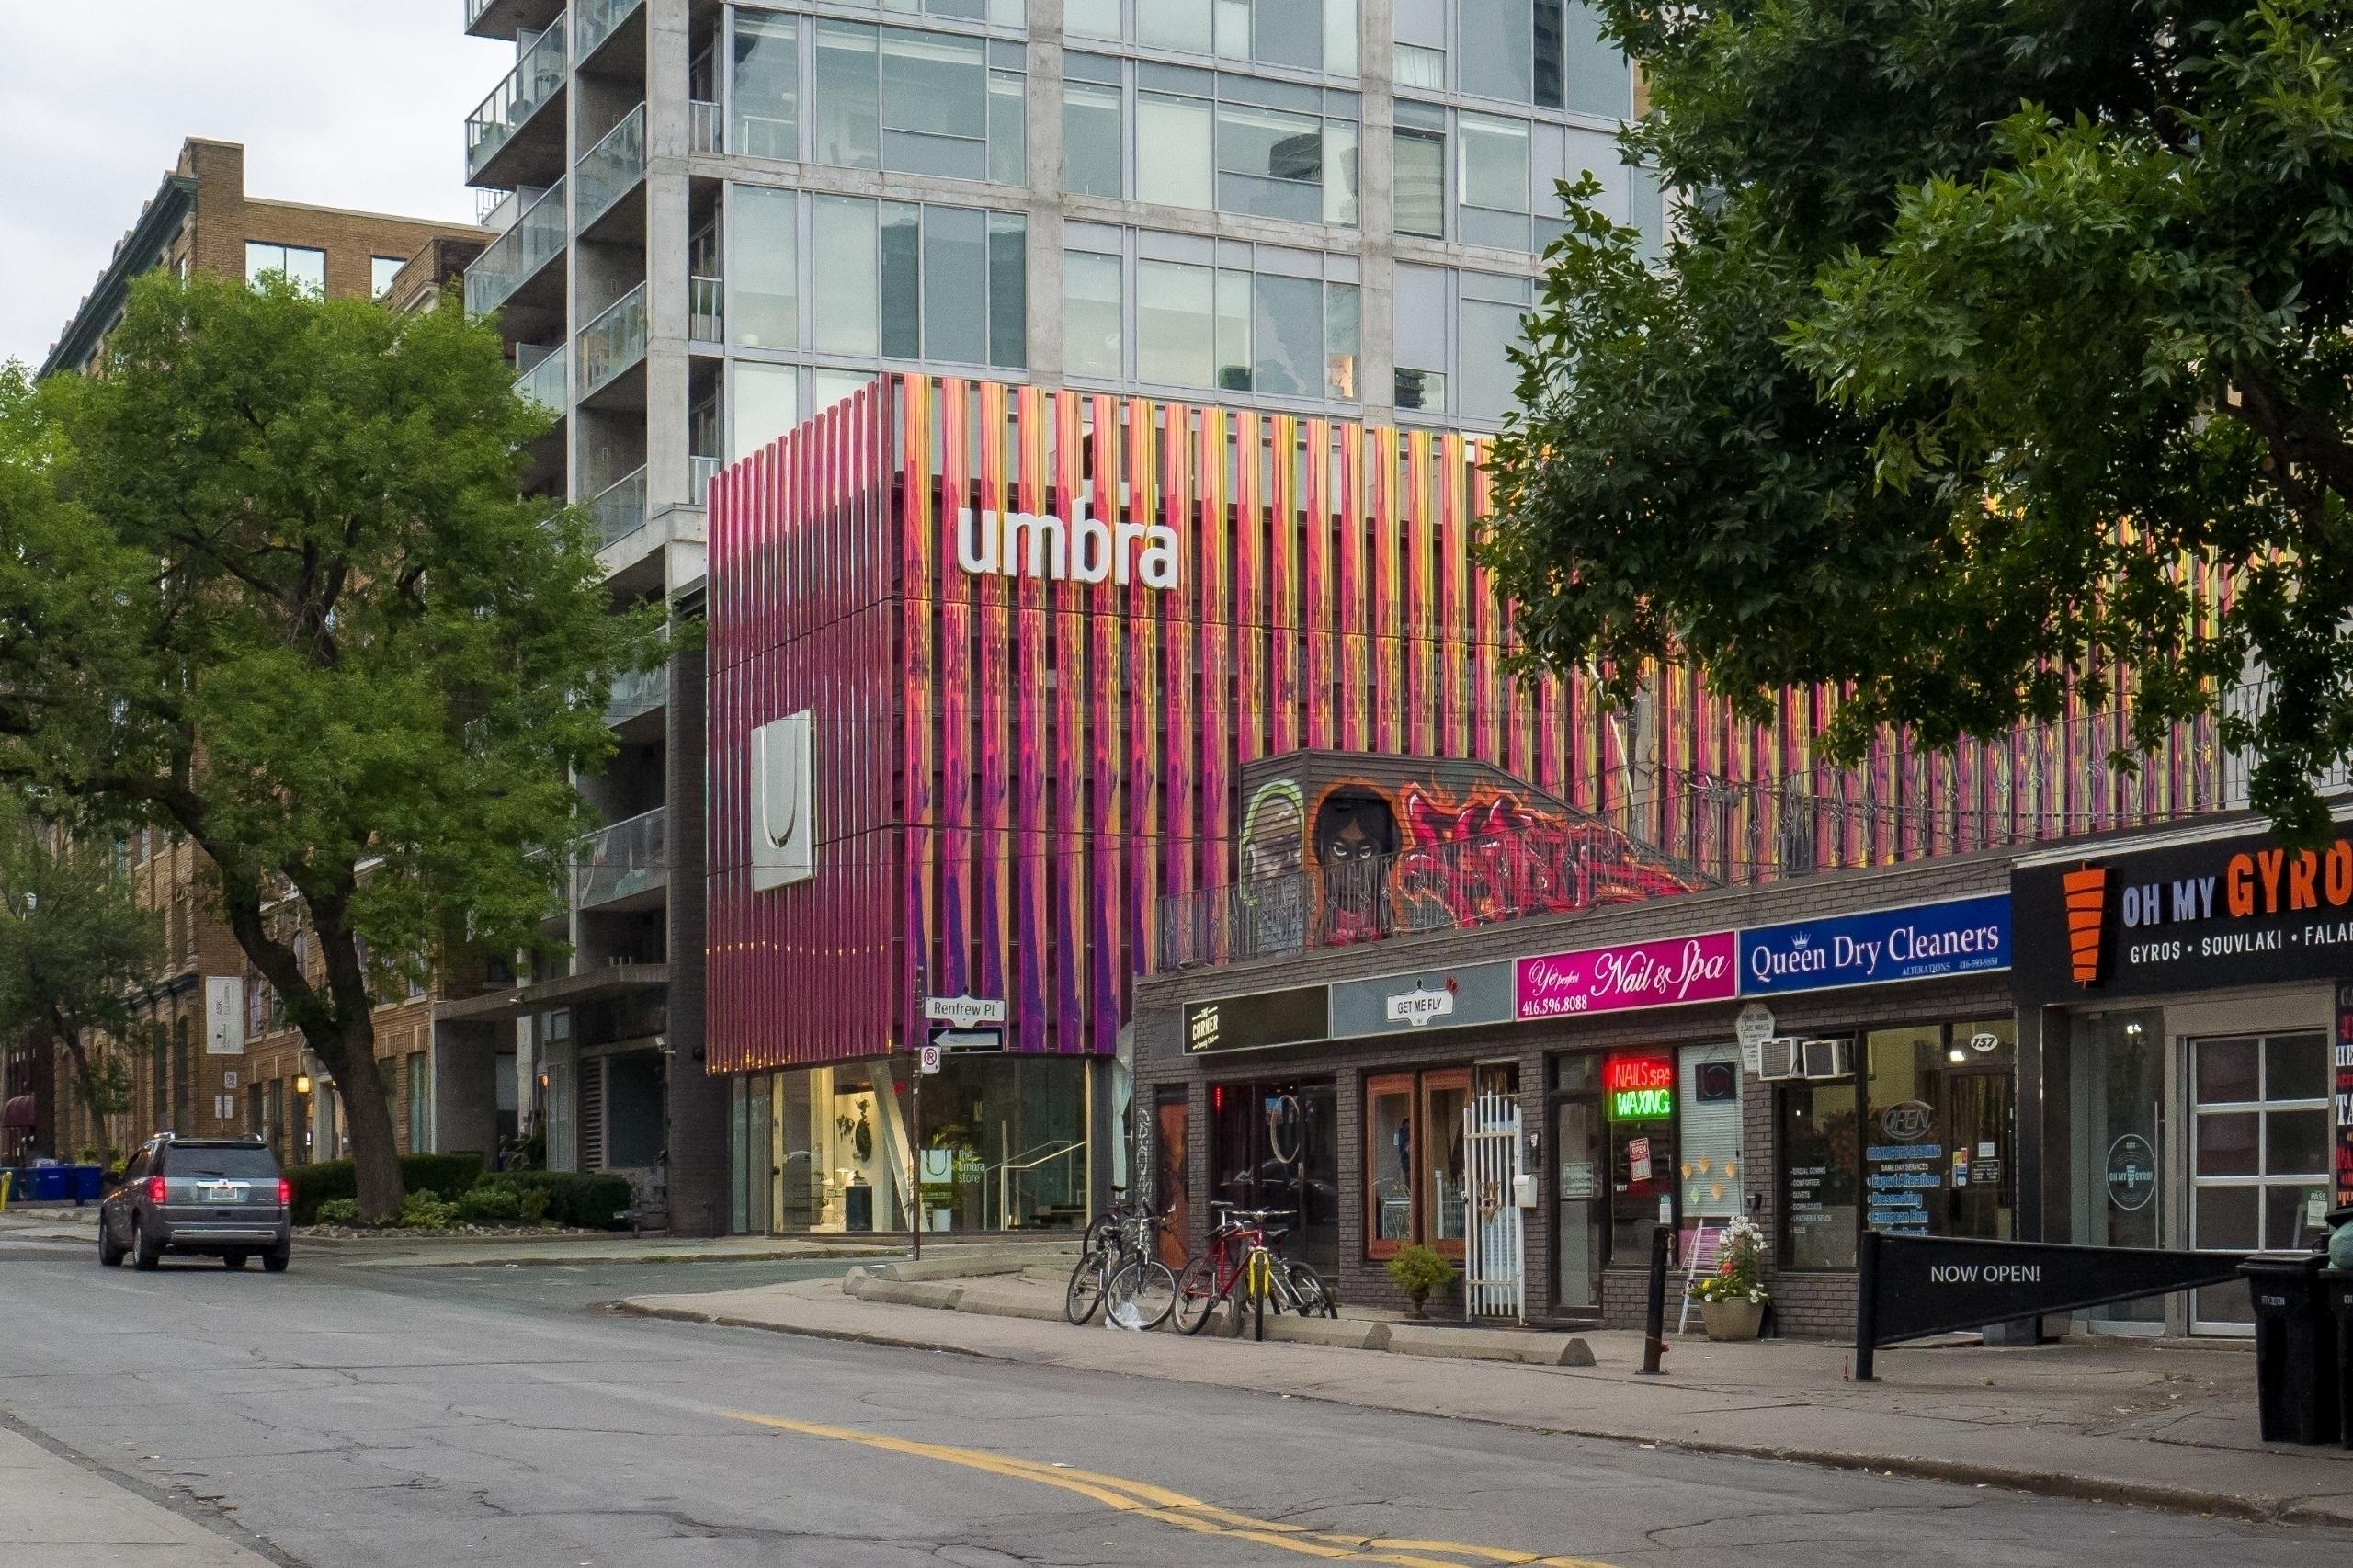 Umbra Concept Store - Toronto A - bostonphotographer | ello